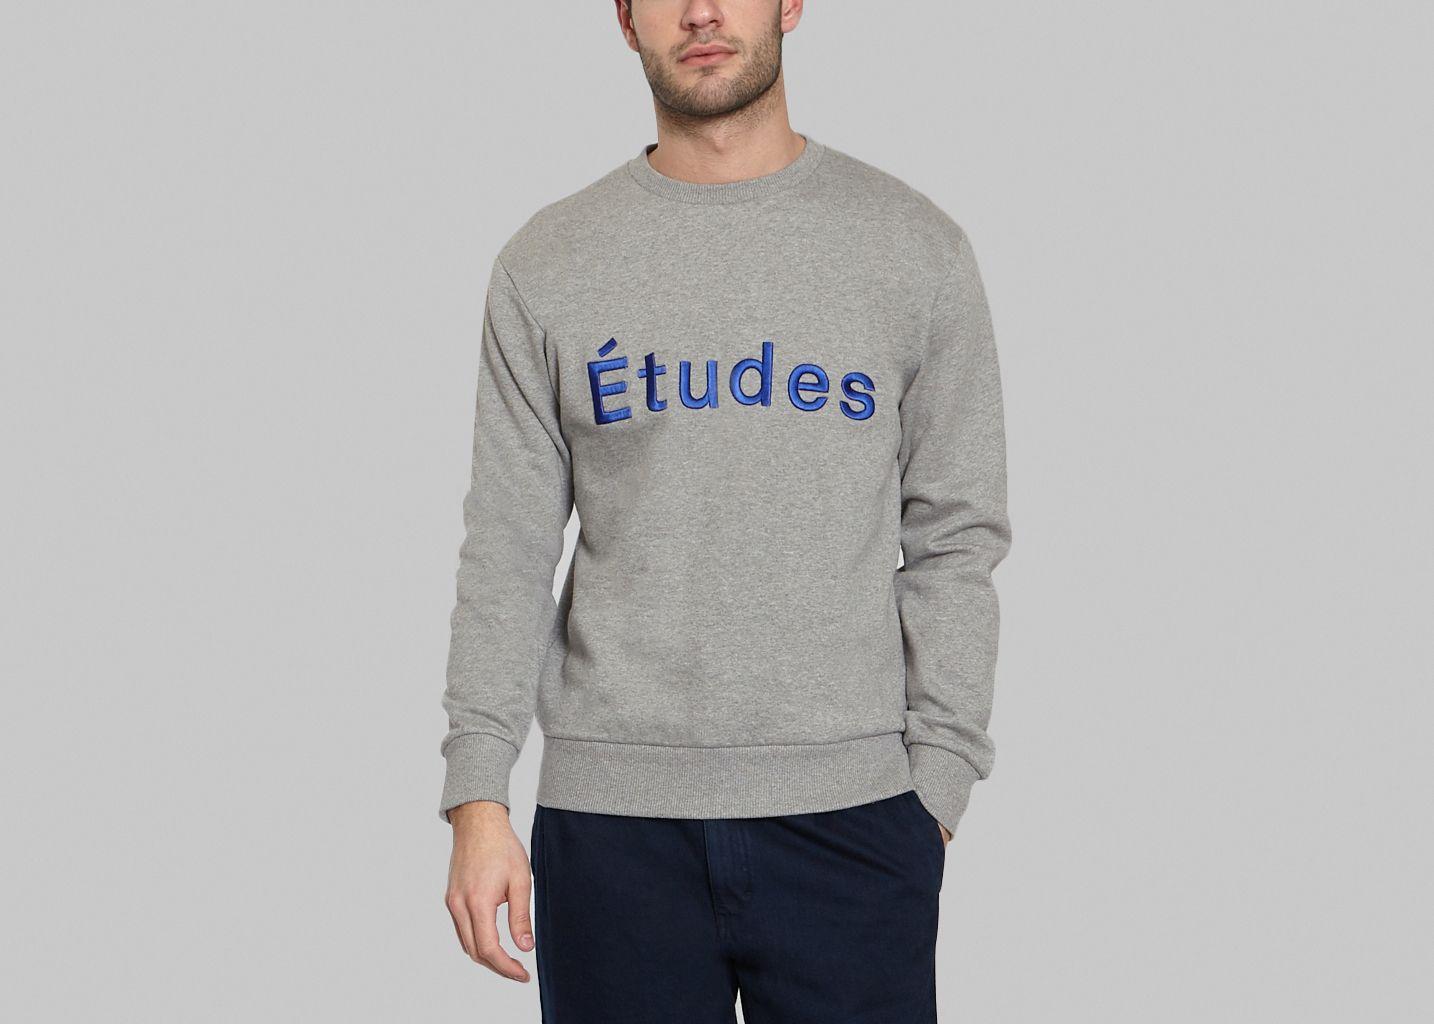 Sweat Etoile Etudes - Études